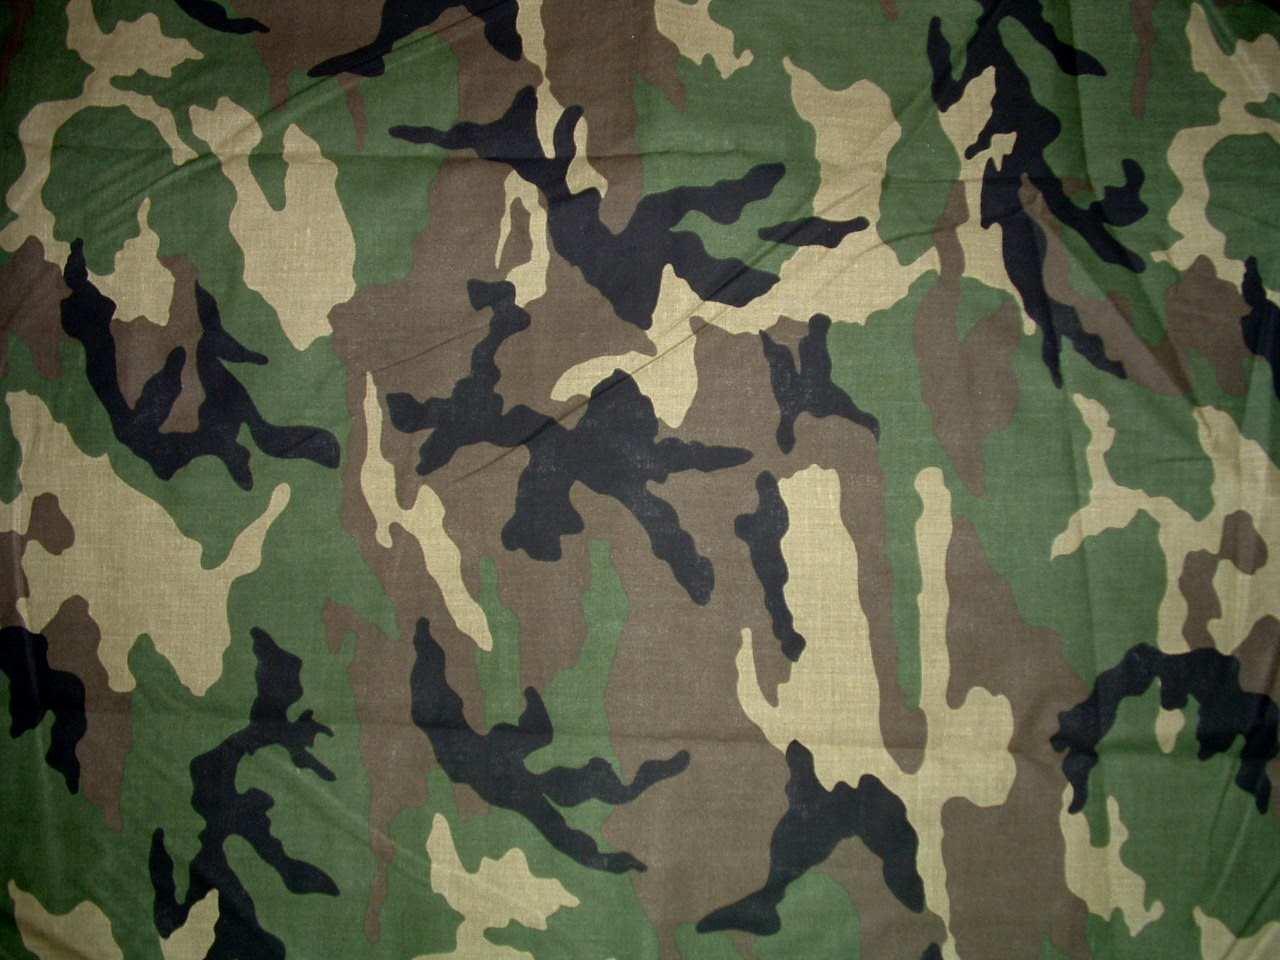 Military Background Desktop Image 1280x960